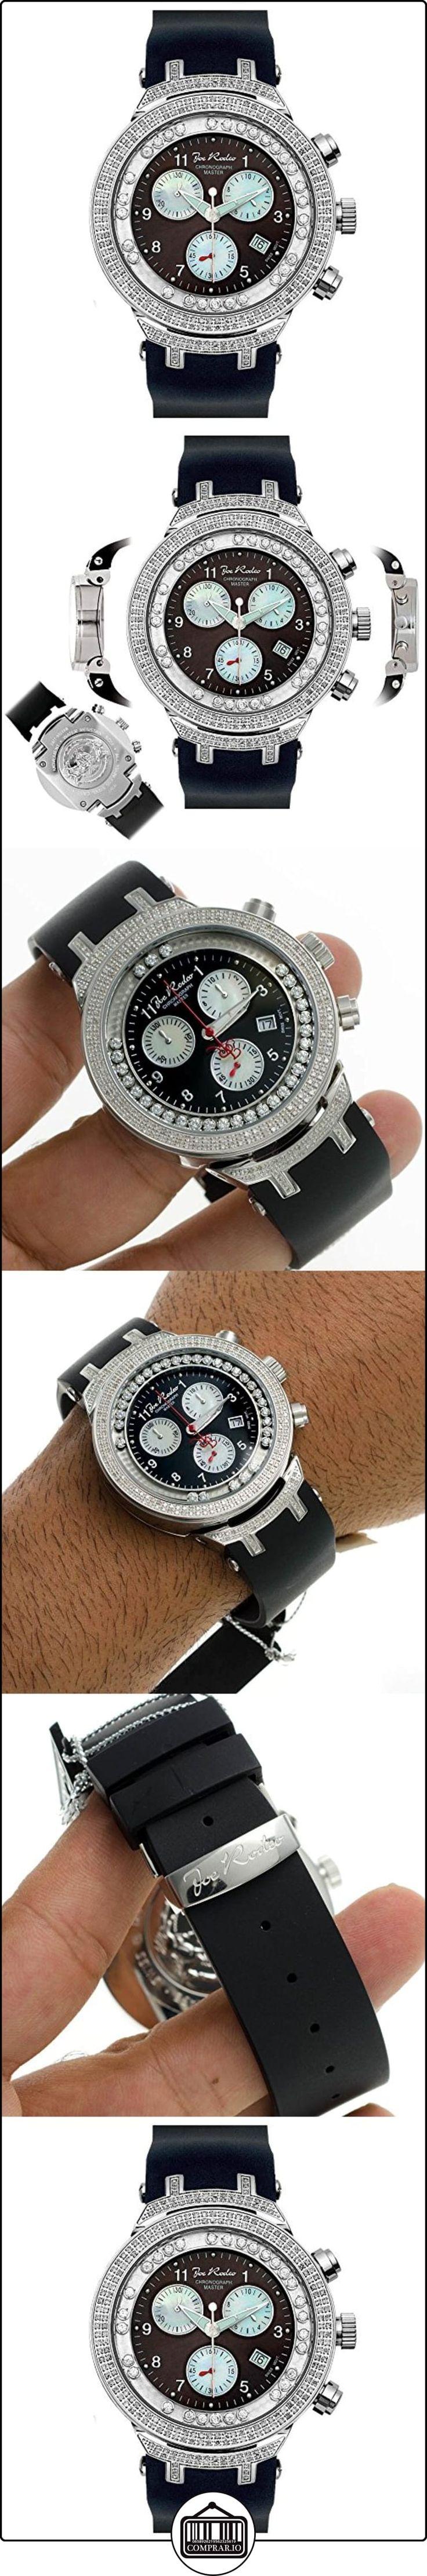 JOE RODEO Diamond Reloj para hombre-Master Plata 2.2quilates  ✿ Relojes para hombre - (Lujo) ✿